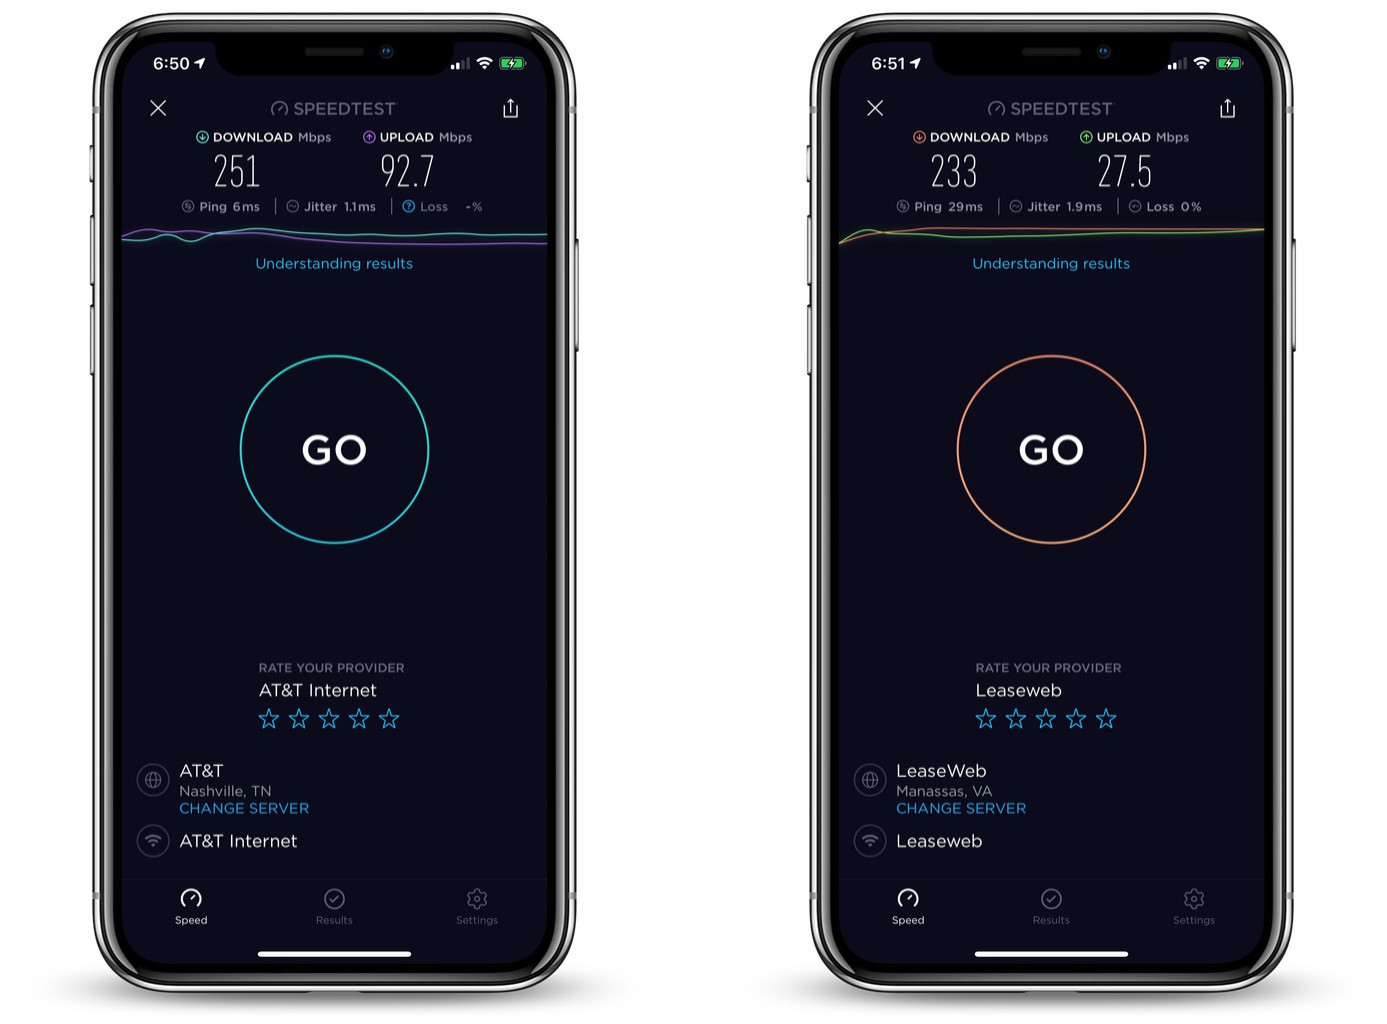 NordVPN_review_ios_app_speedtest